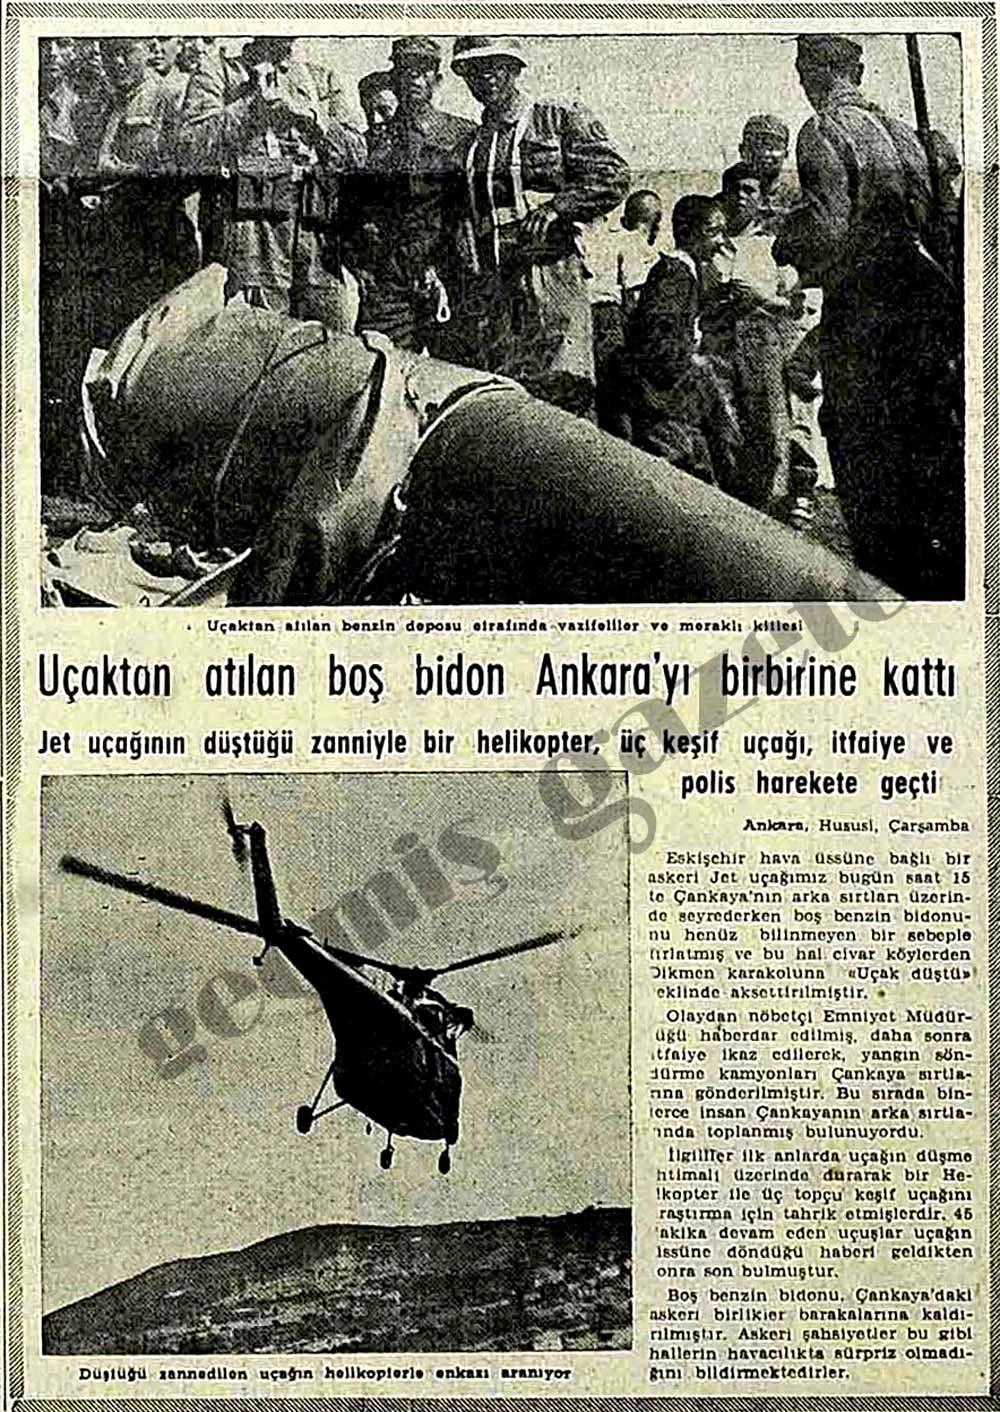 Uçaktan atılan boş bidon Ankara'yı birbirine kattı